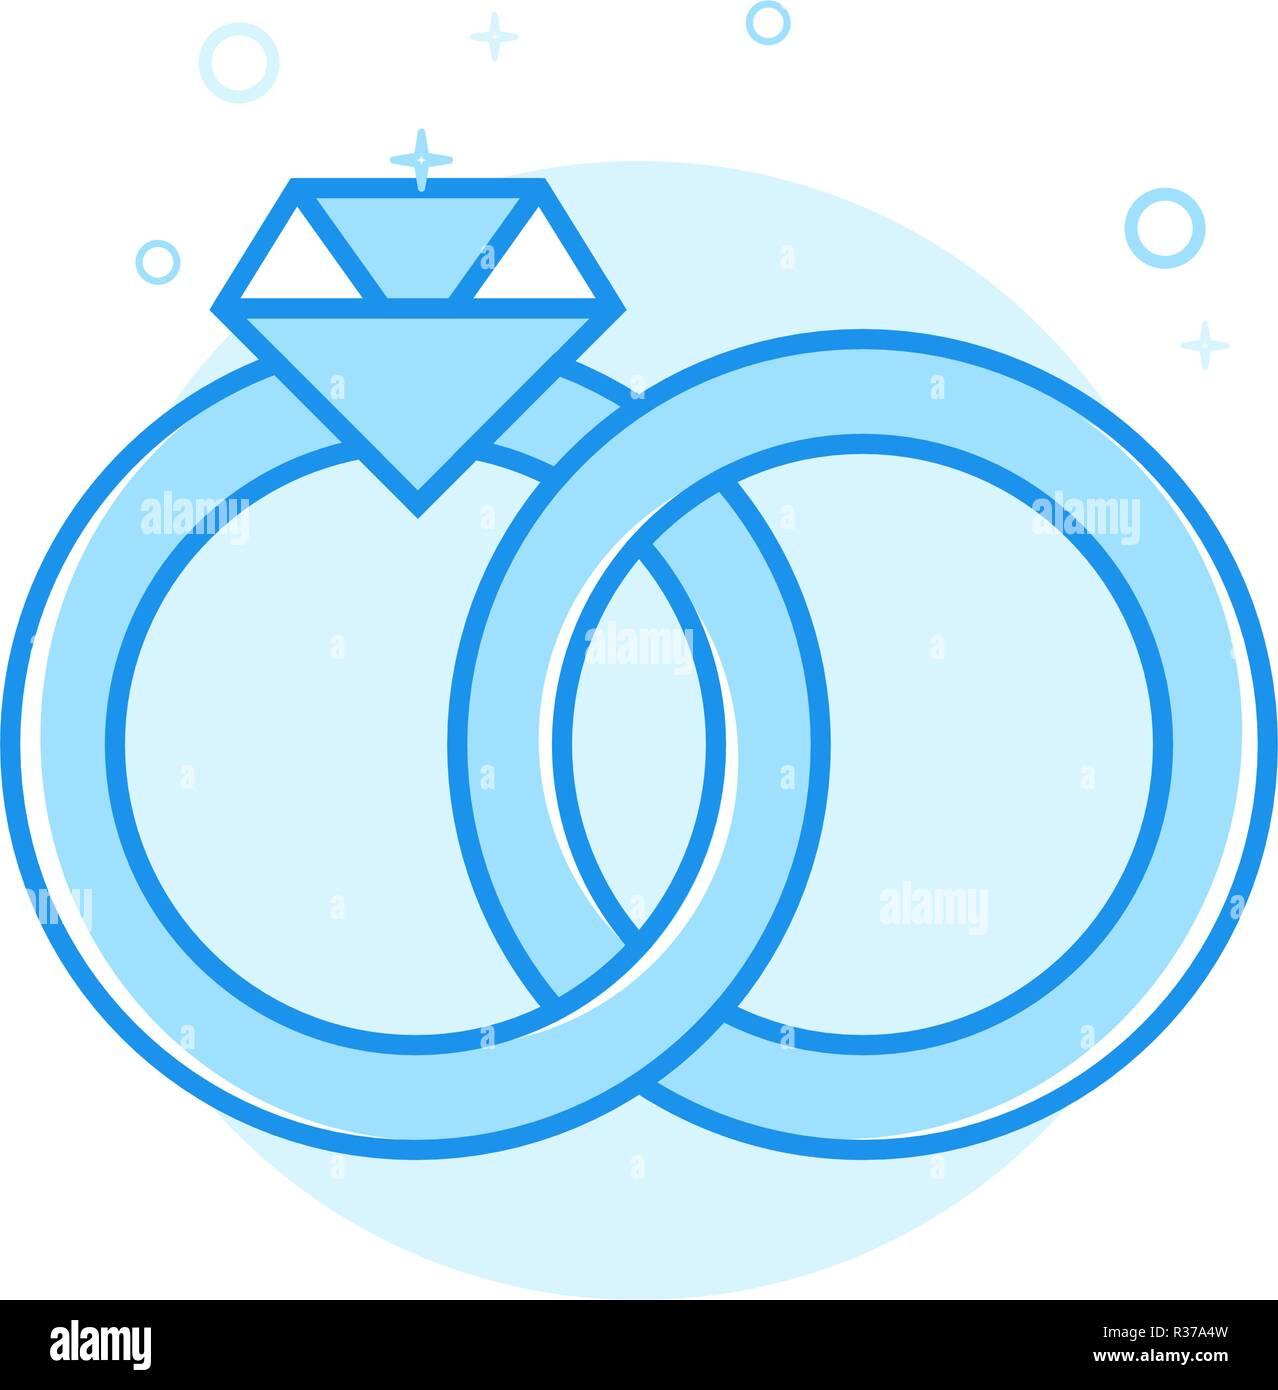 Wedding Rings Flat Vector Icon, Symbol, Pictogram, Sign. Light Blue Monochrome Design. Editable Stroke - Stock Image